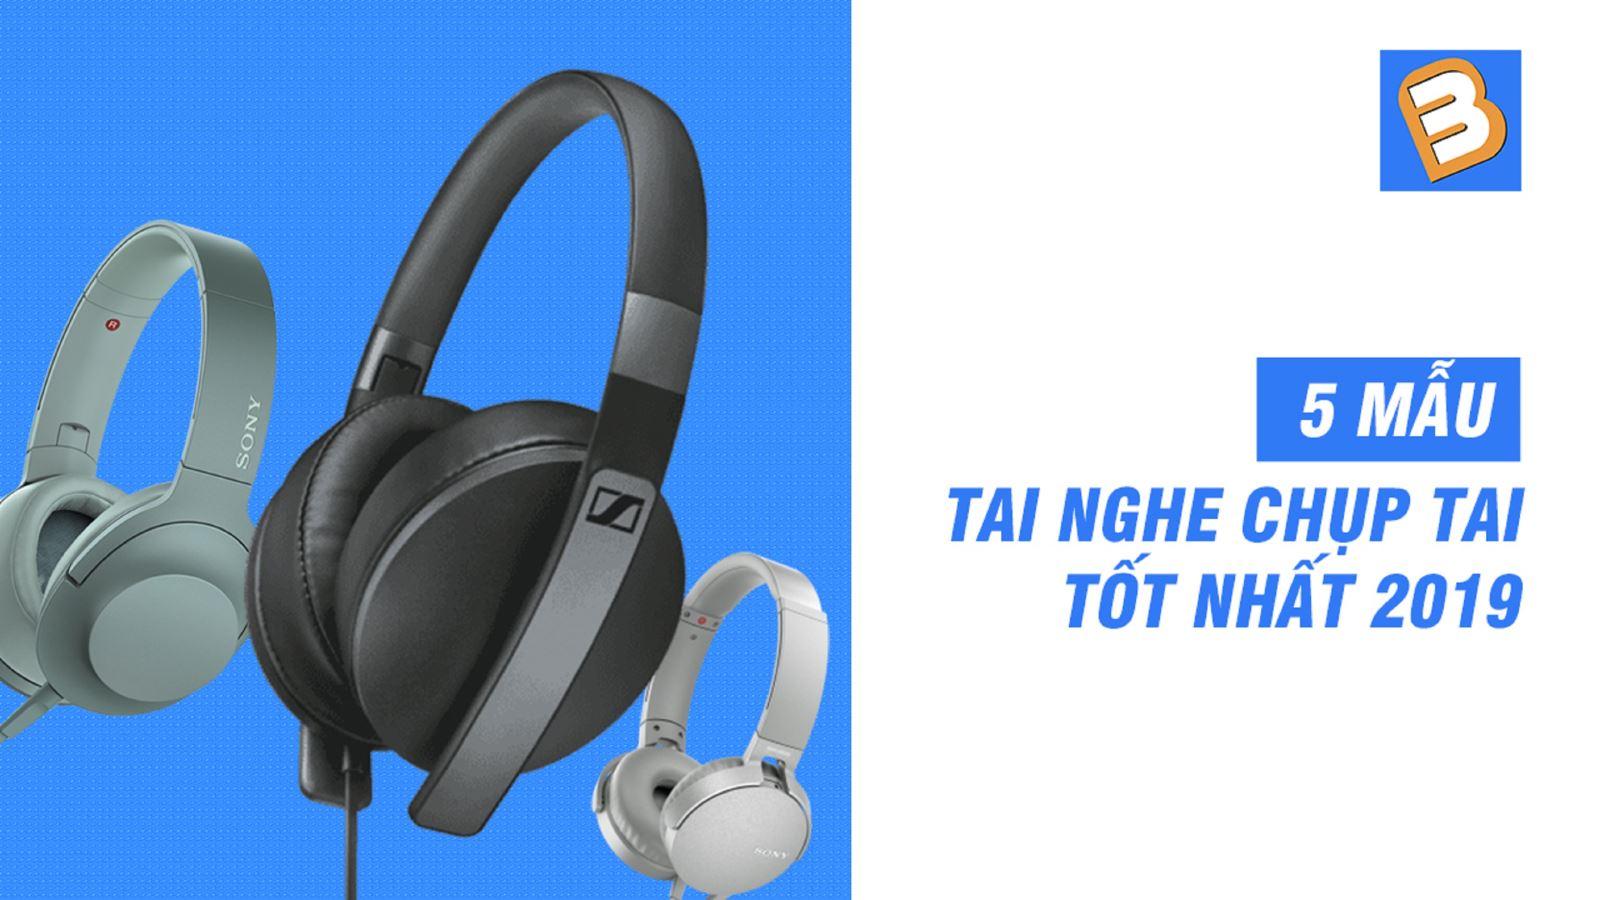 5 mẫu tai nghe chụp tai tốt nhất 2019